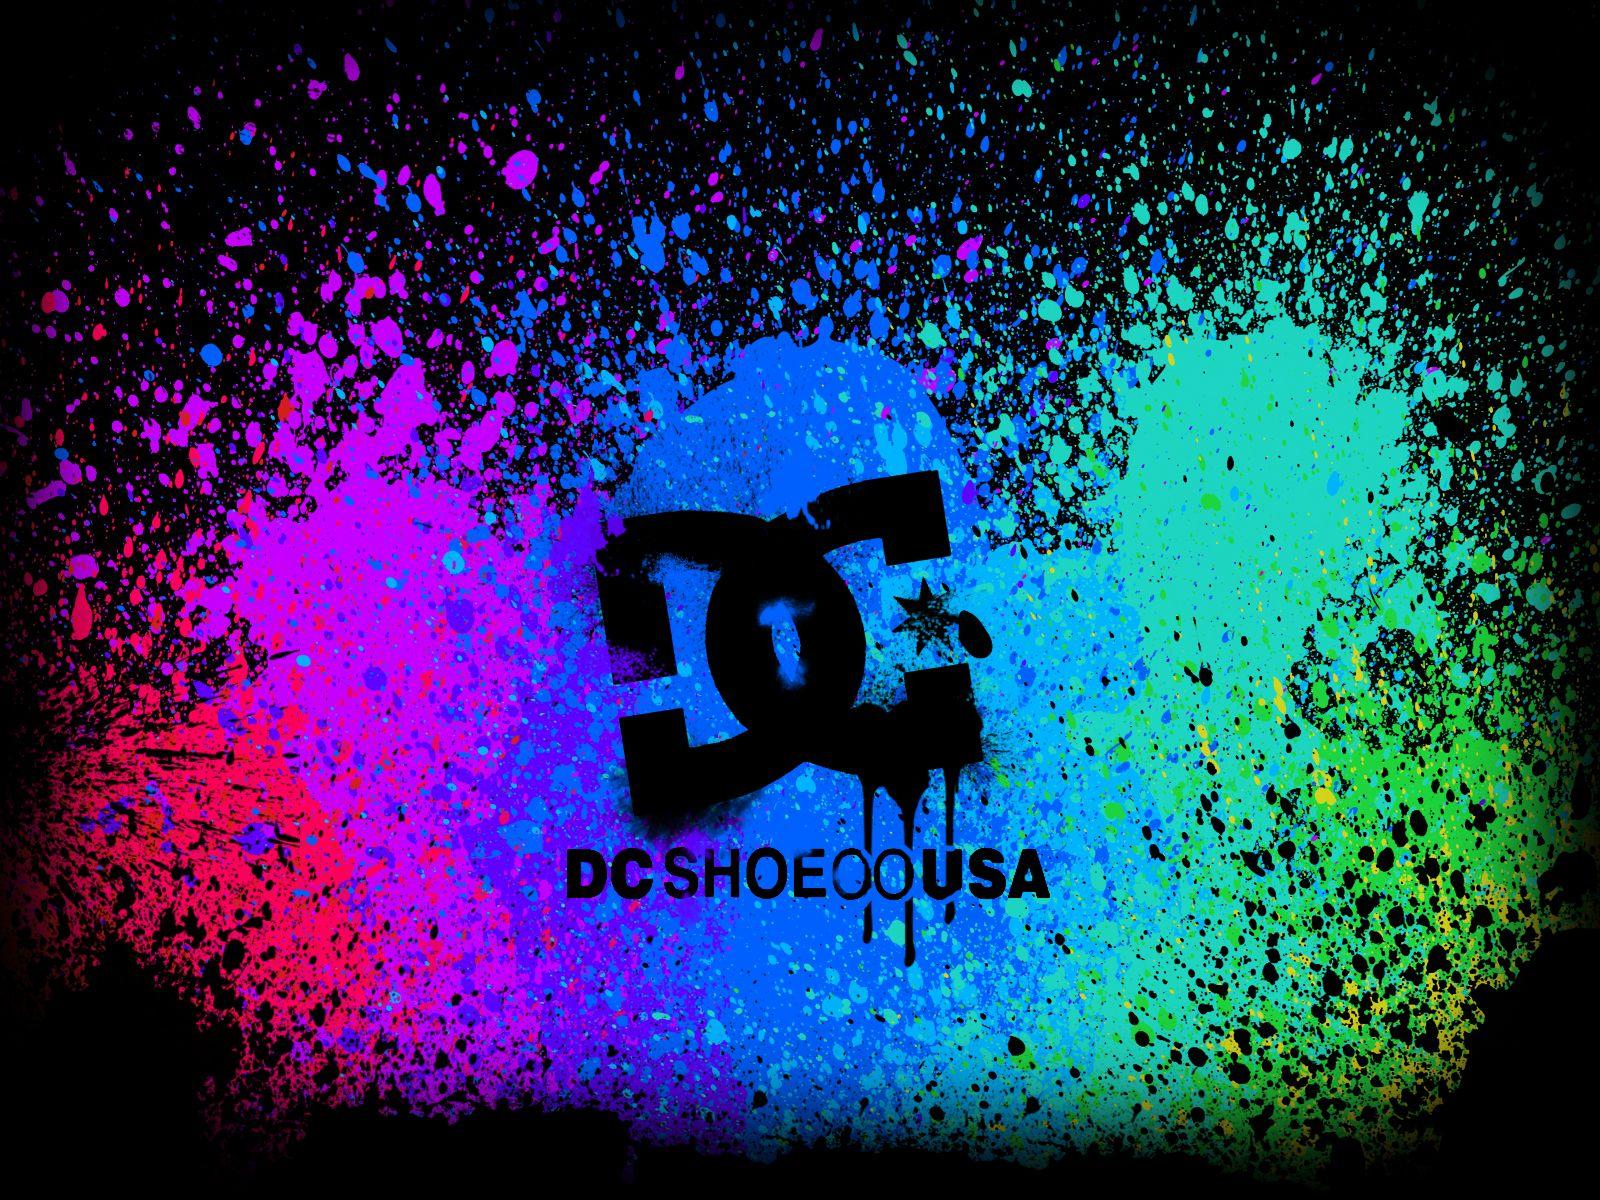 Wallpapers Dc Shoes Taringa 壁紙 Iphone壁紙